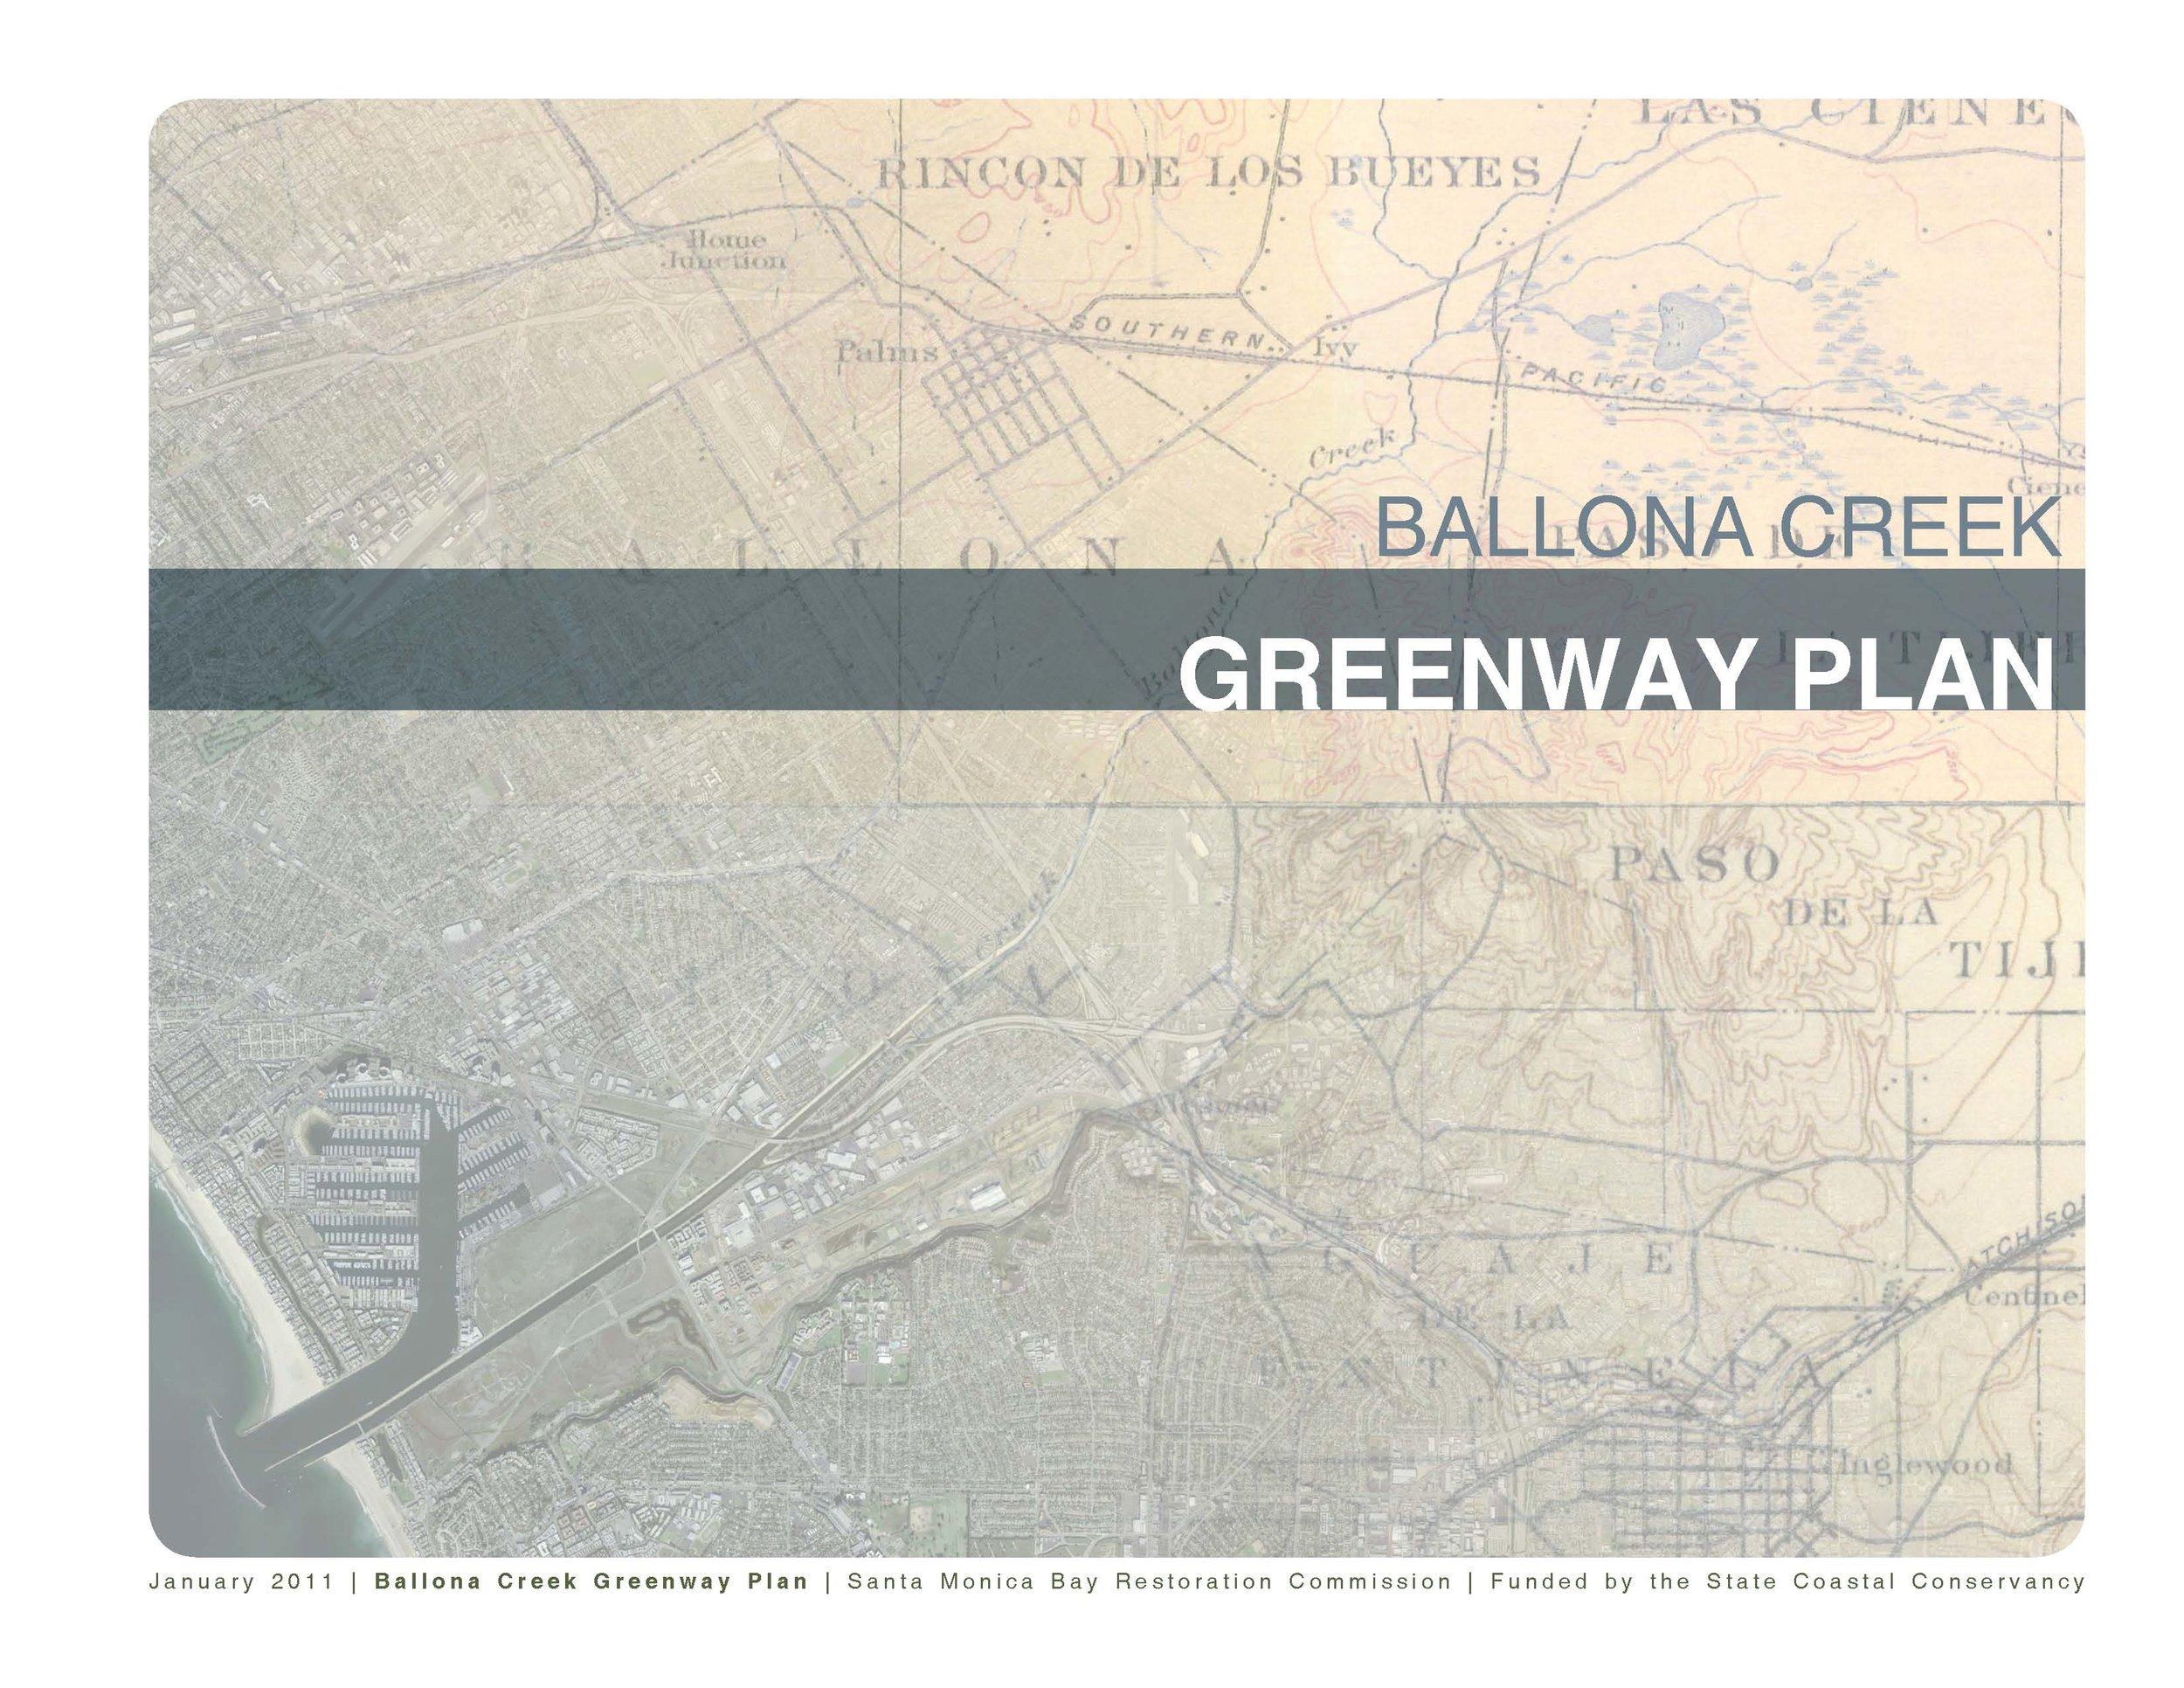 - Ballona Creek Greenway Plan (Santa Monica Bay Restoration Foundation)Westside Urban Forum Design Awards